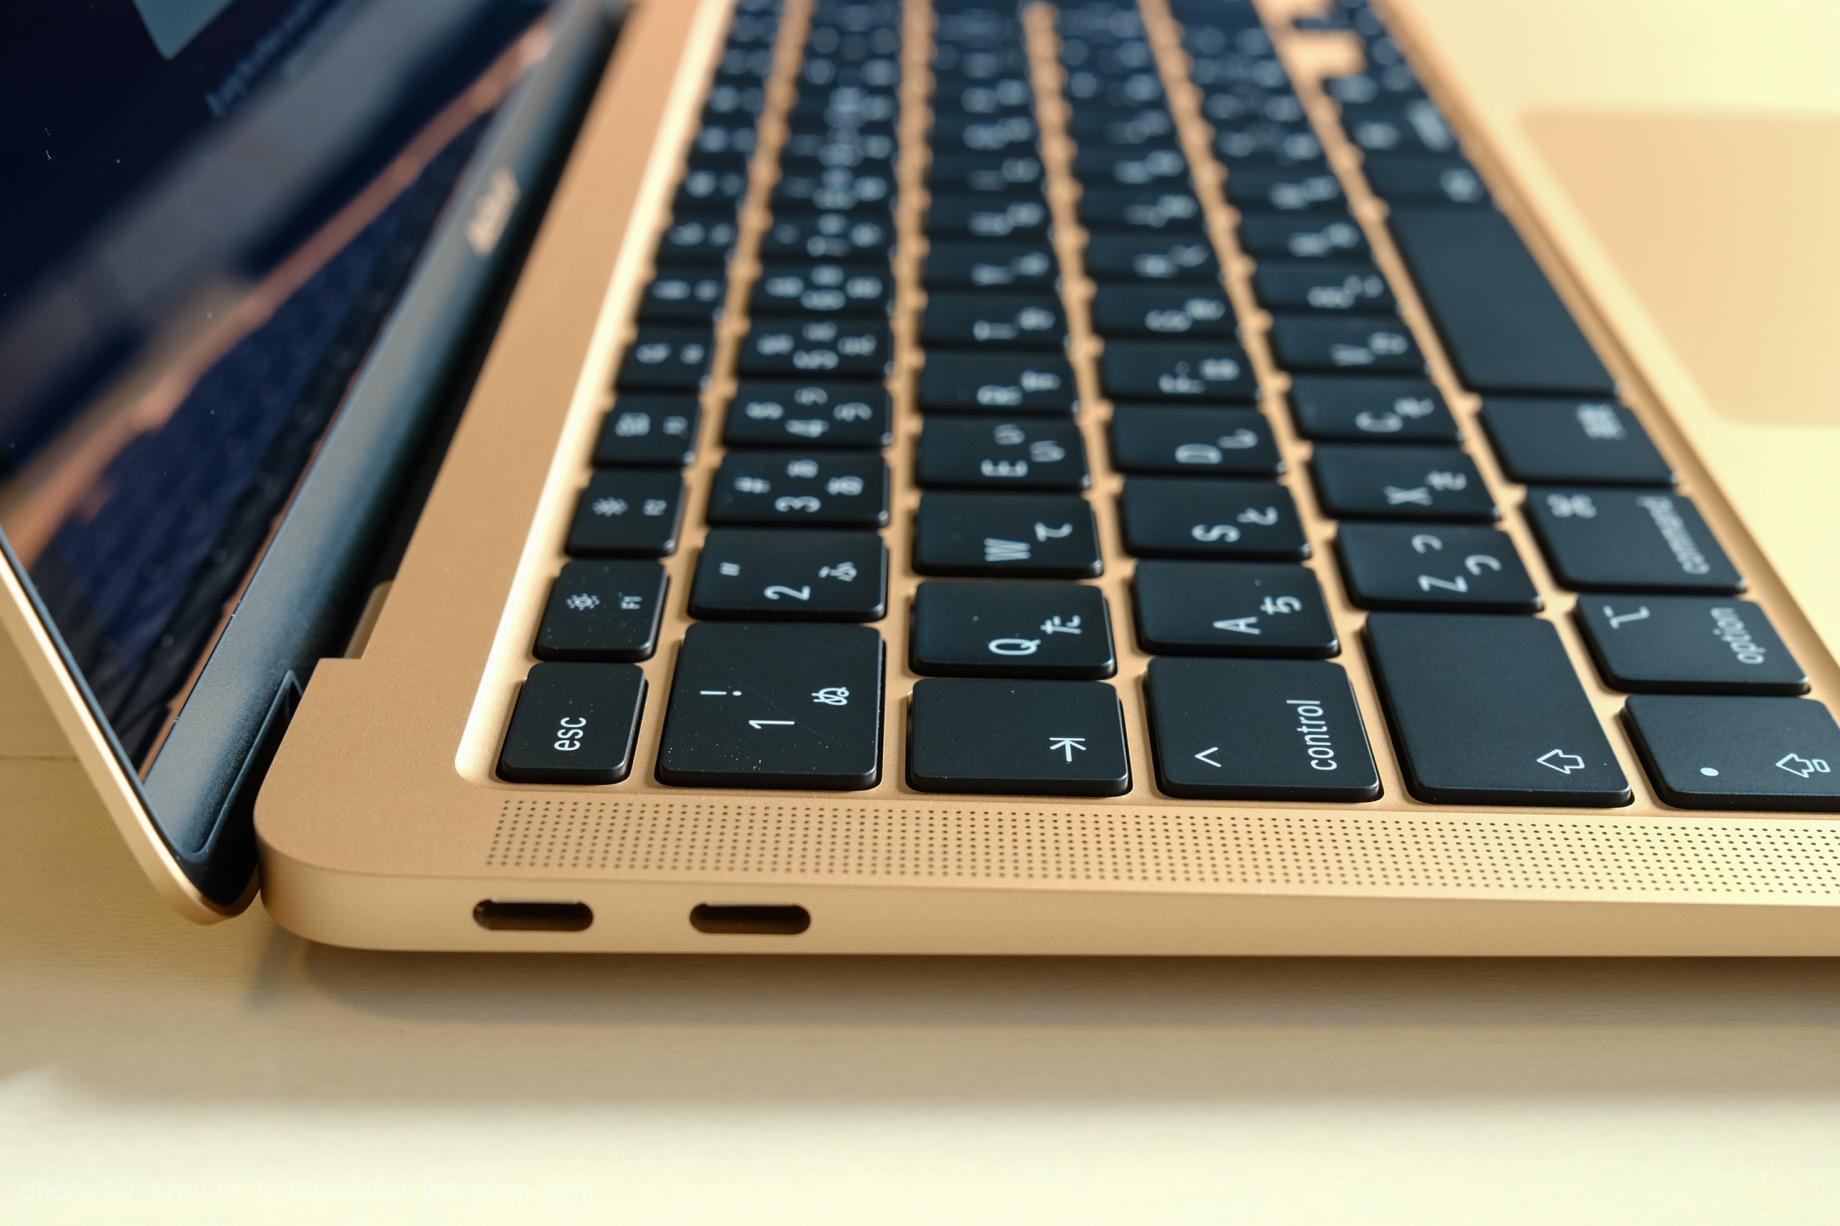 Magic Keyboard MacBook Air 2020